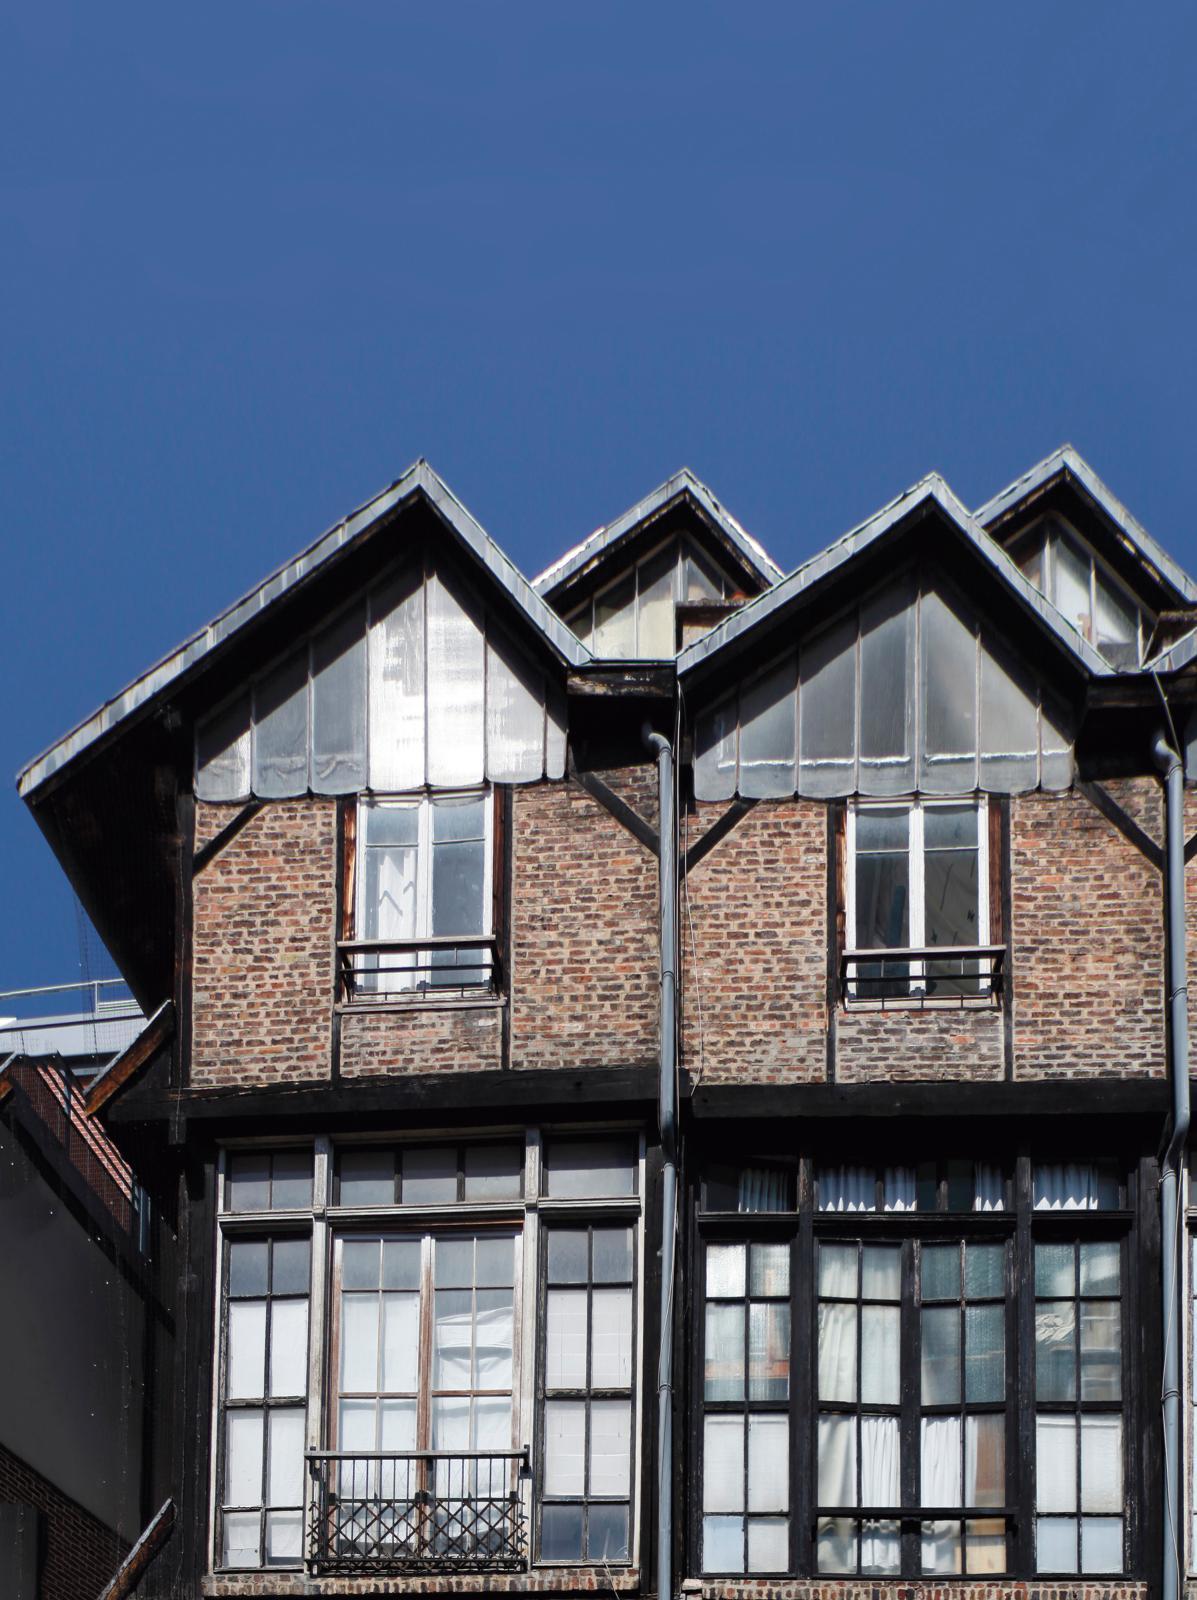 Le bâtiment Fernand Léger. ©Nelly Maurel